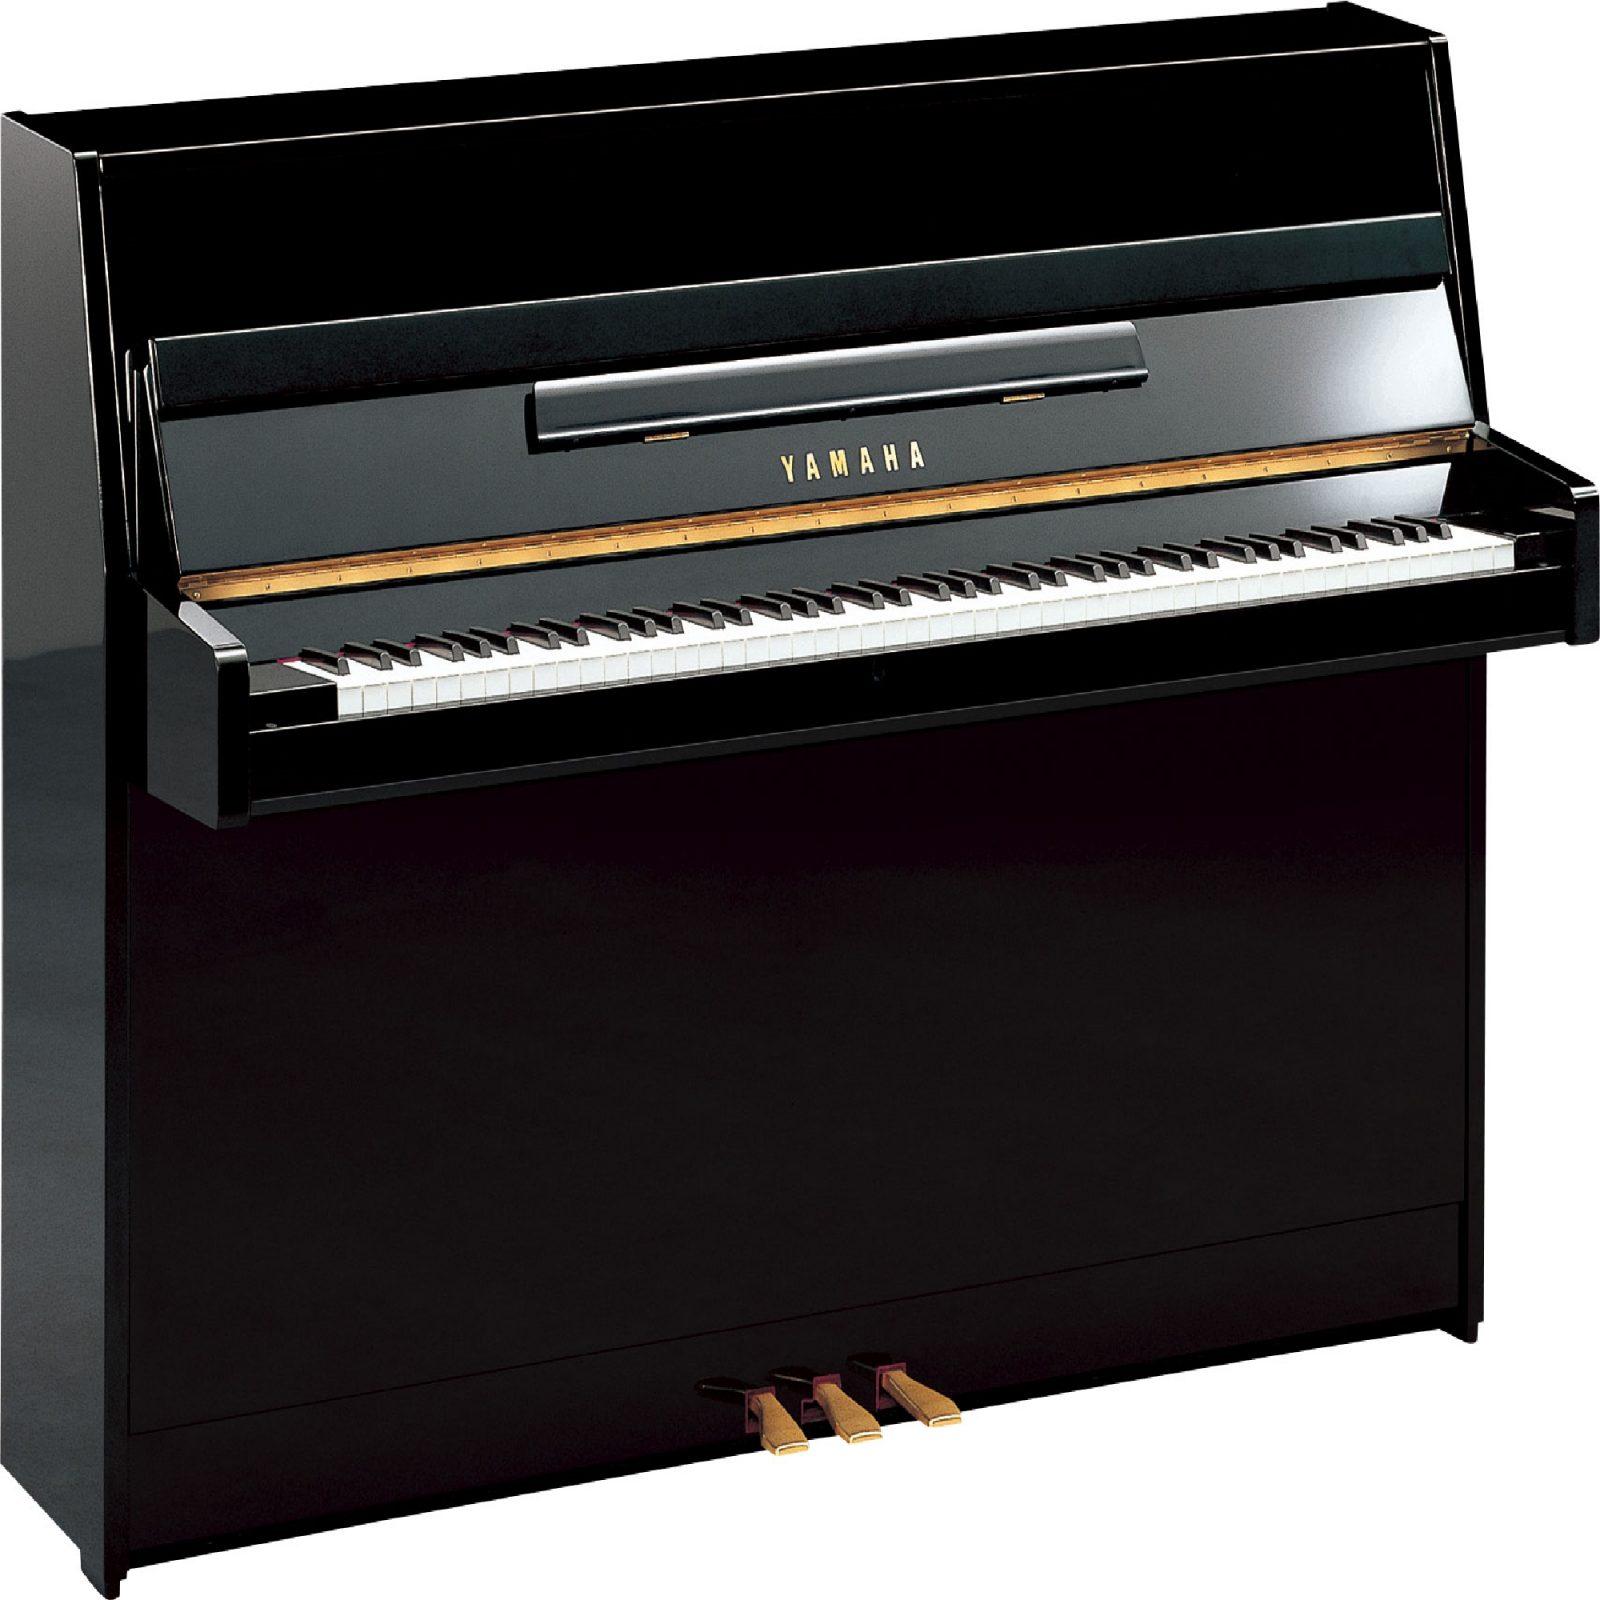 Yamaha b1 upright piano black polyester sherwood phoenix for Yamaha electric upright piano